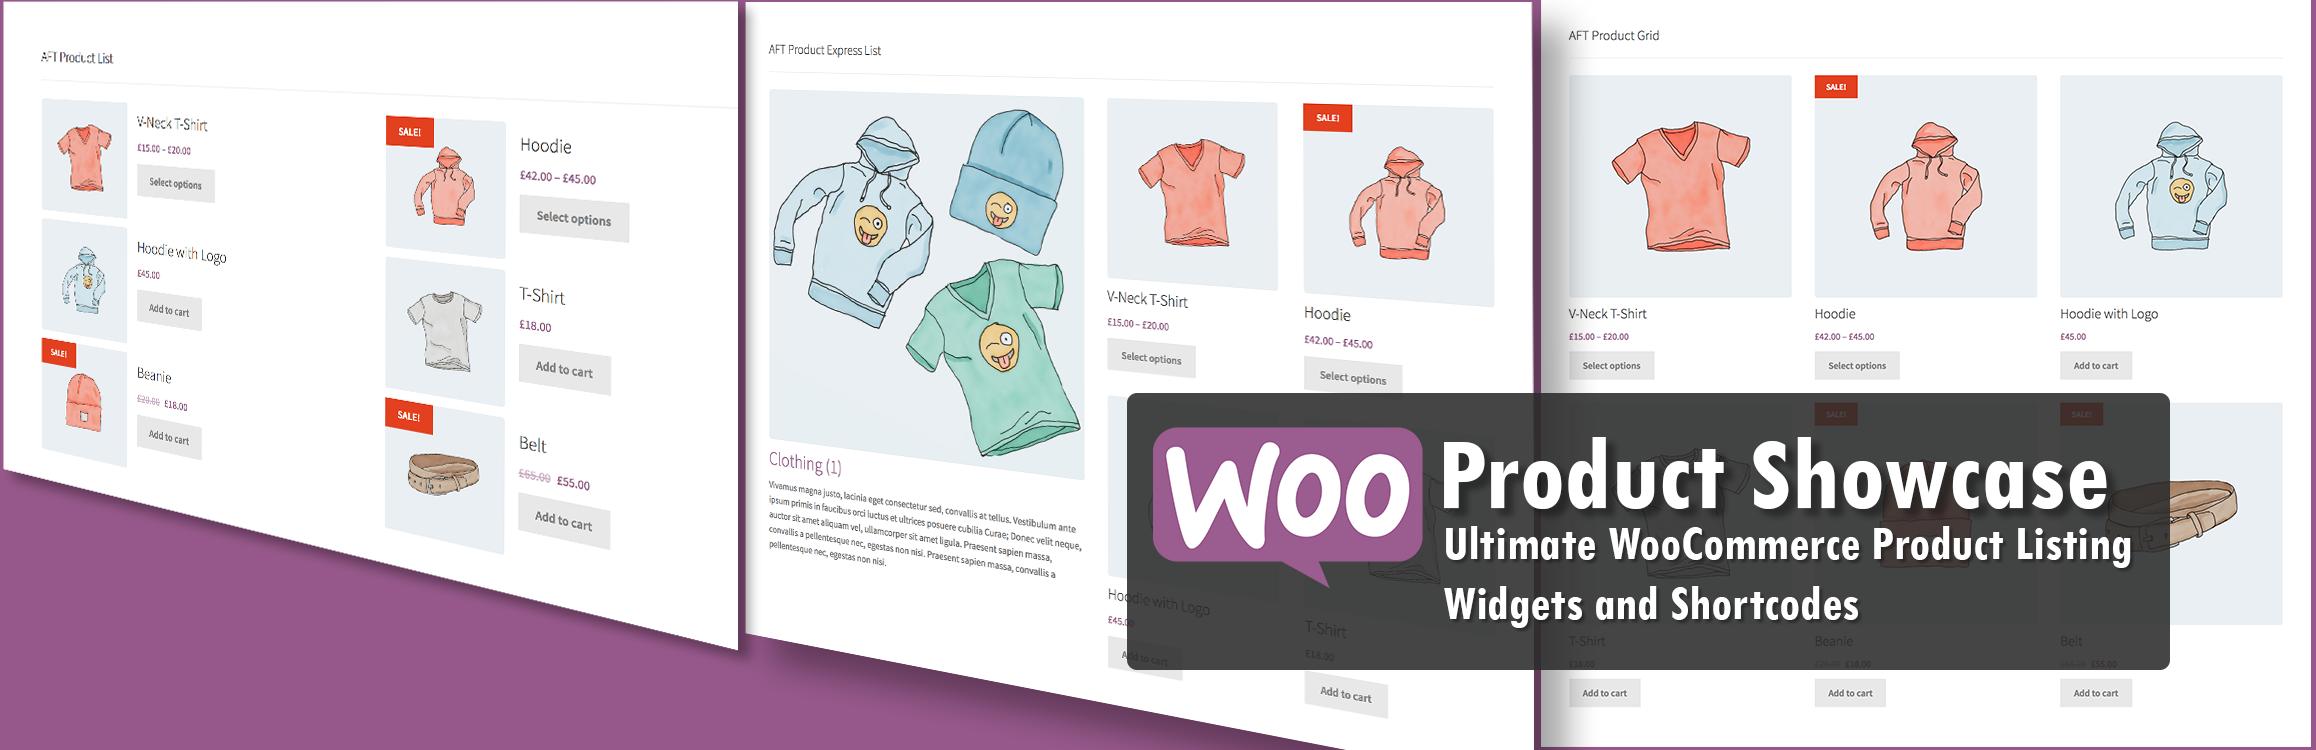 Woo Product Showcase